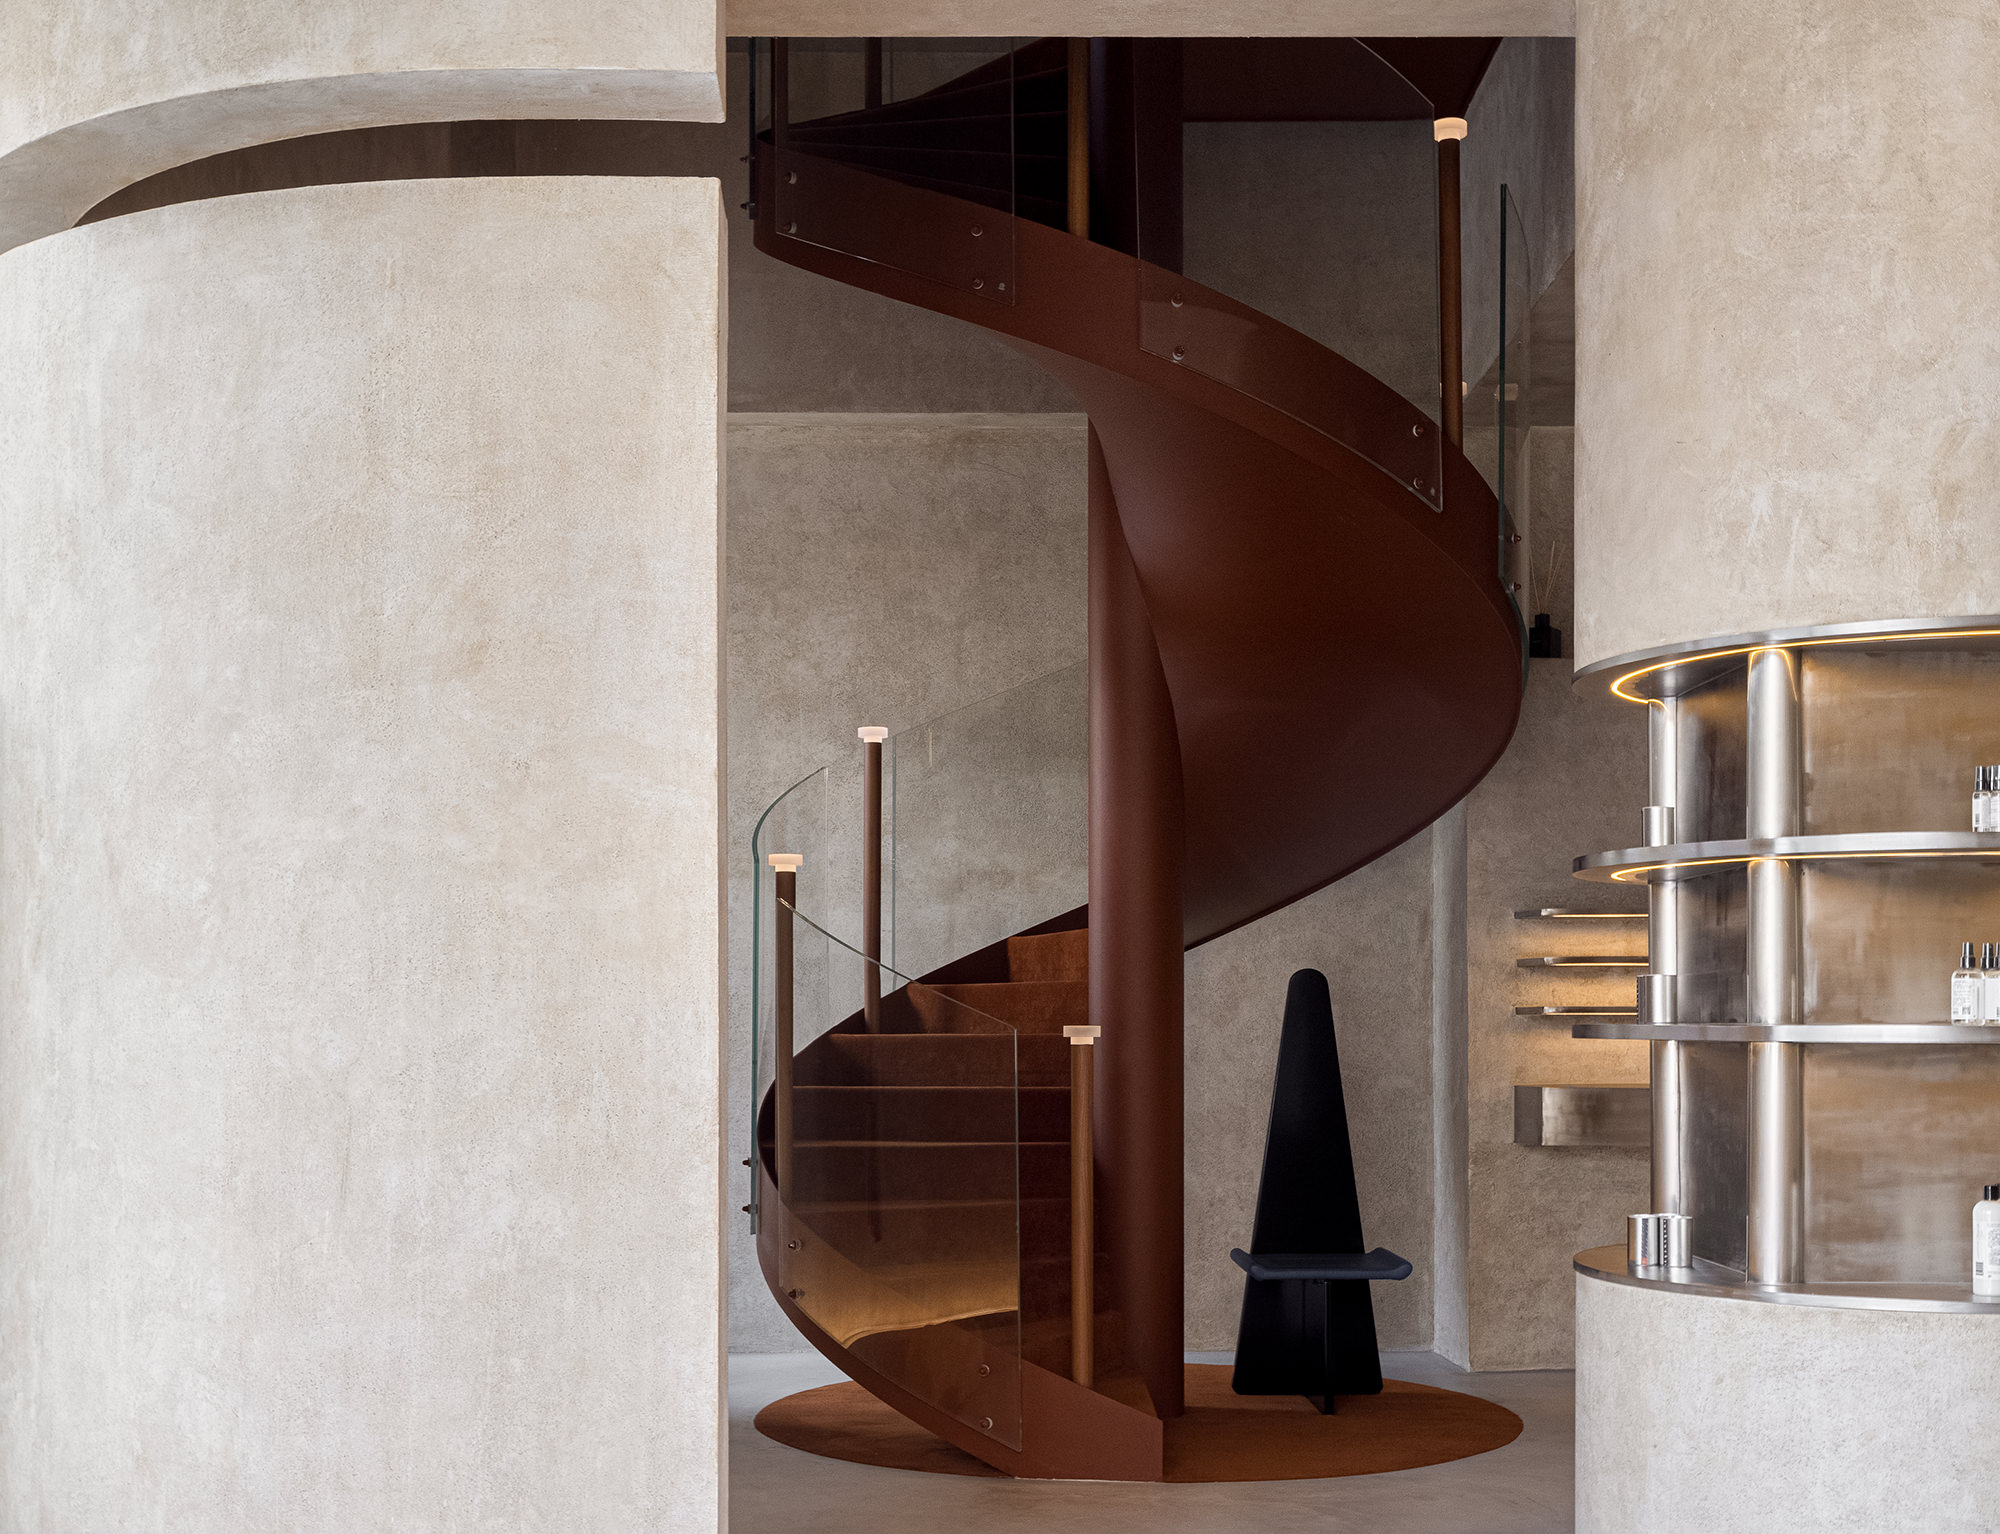 Liang Architecture Studio Audrey Boutique Hangzhou China Luxury Retail Photo Shao Feng Yellowtrace 04